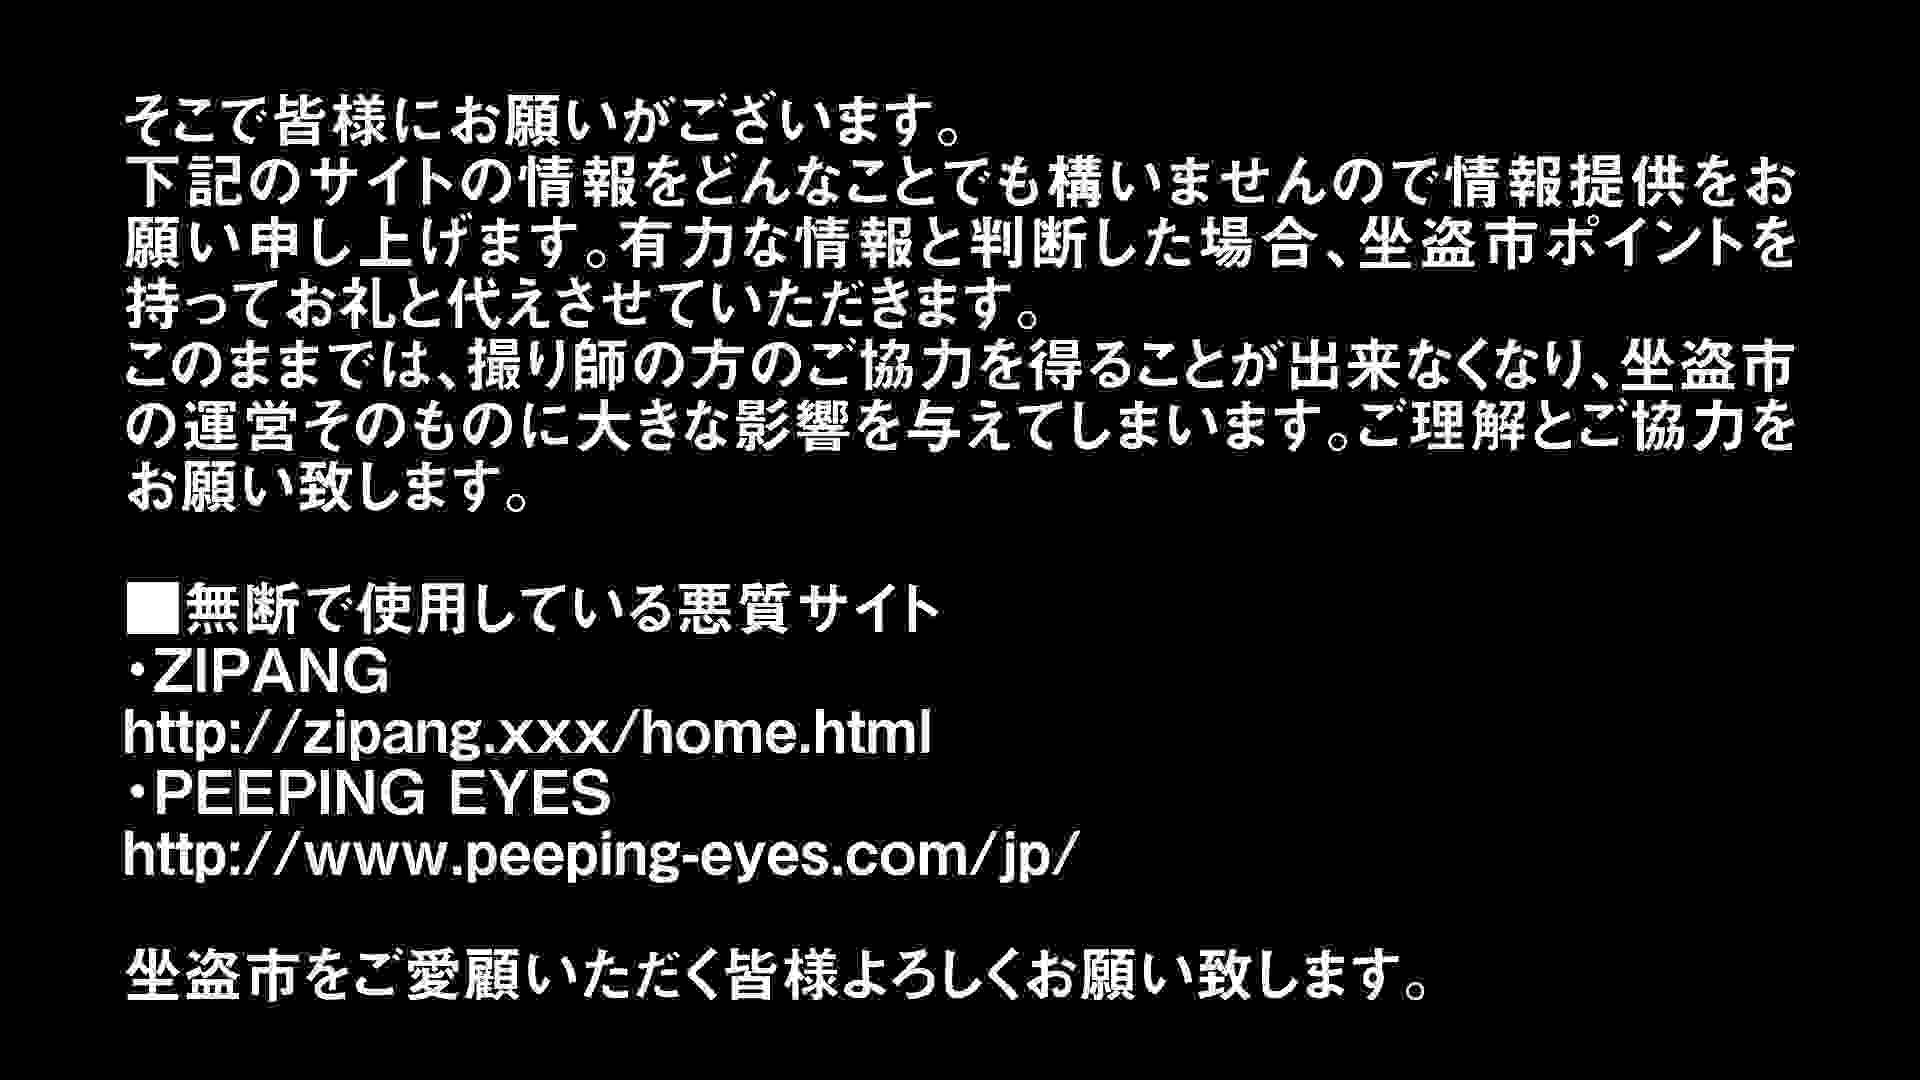 Aquaな露天風呂Vol.296 盗撮シリーズ   露天風呂編  102PIX 47